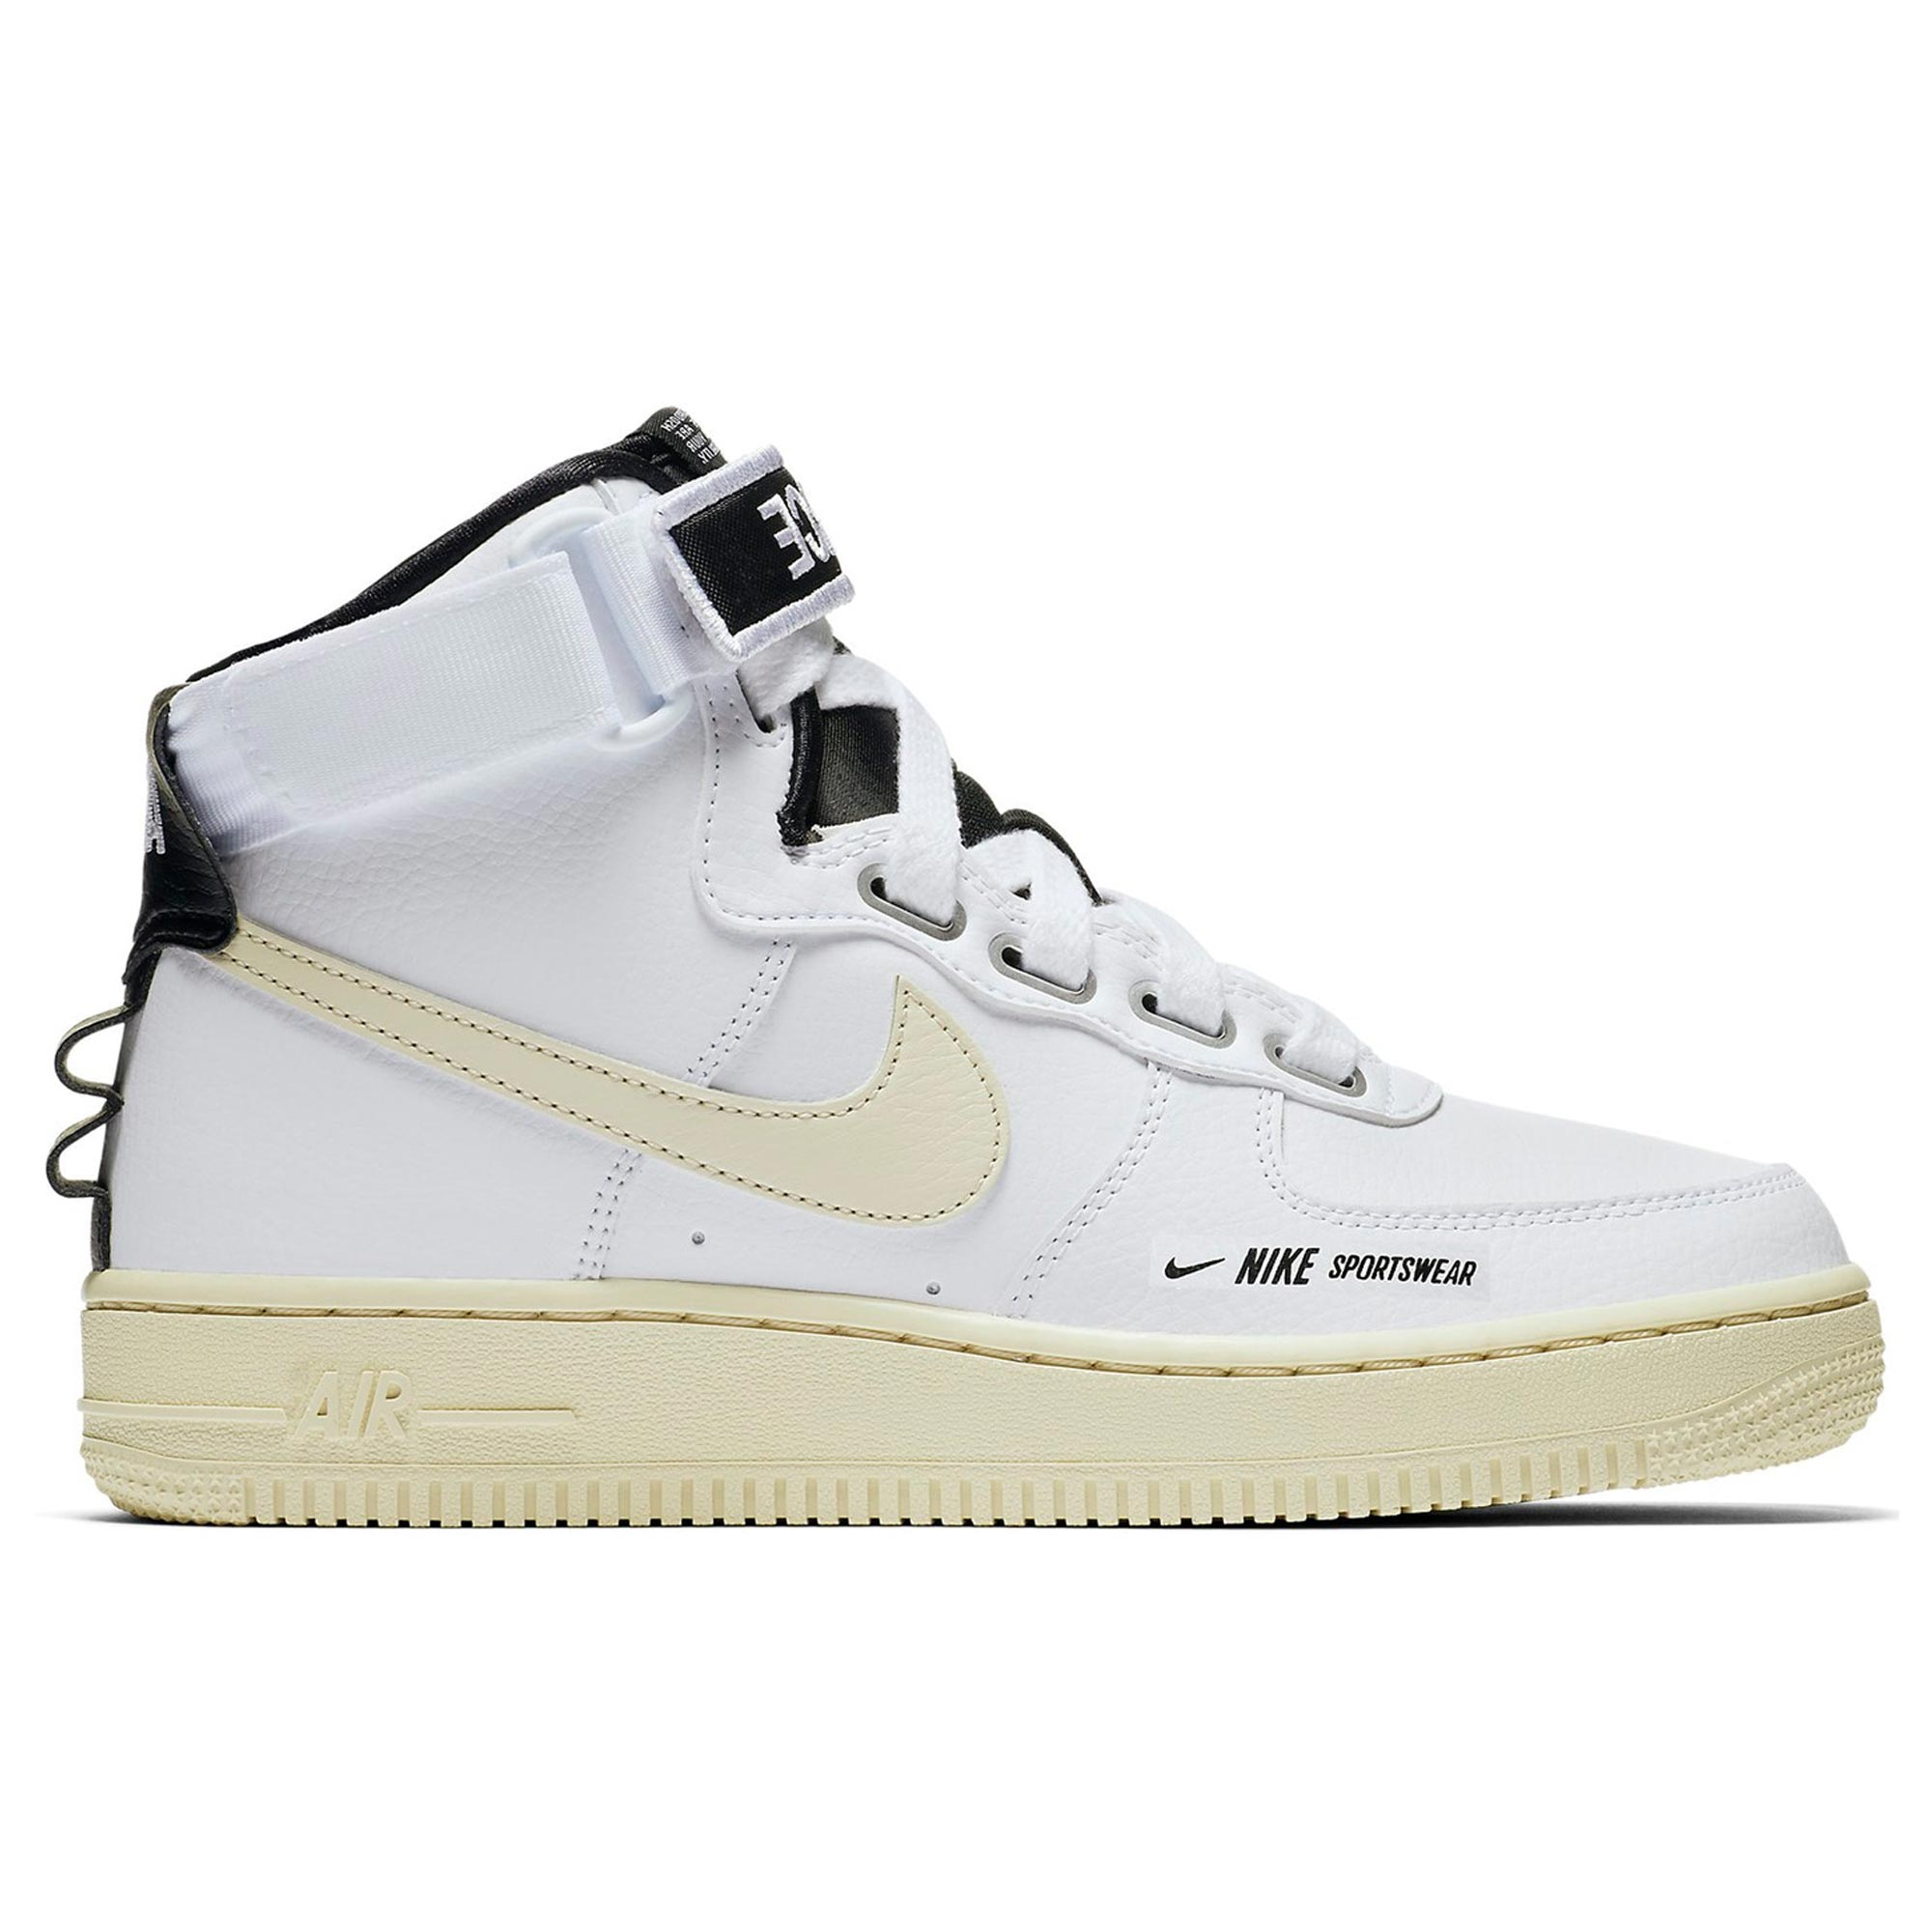 super popular 1f7ea b5156 Nike W AF1 HI UT, (AJ7311-100-8)